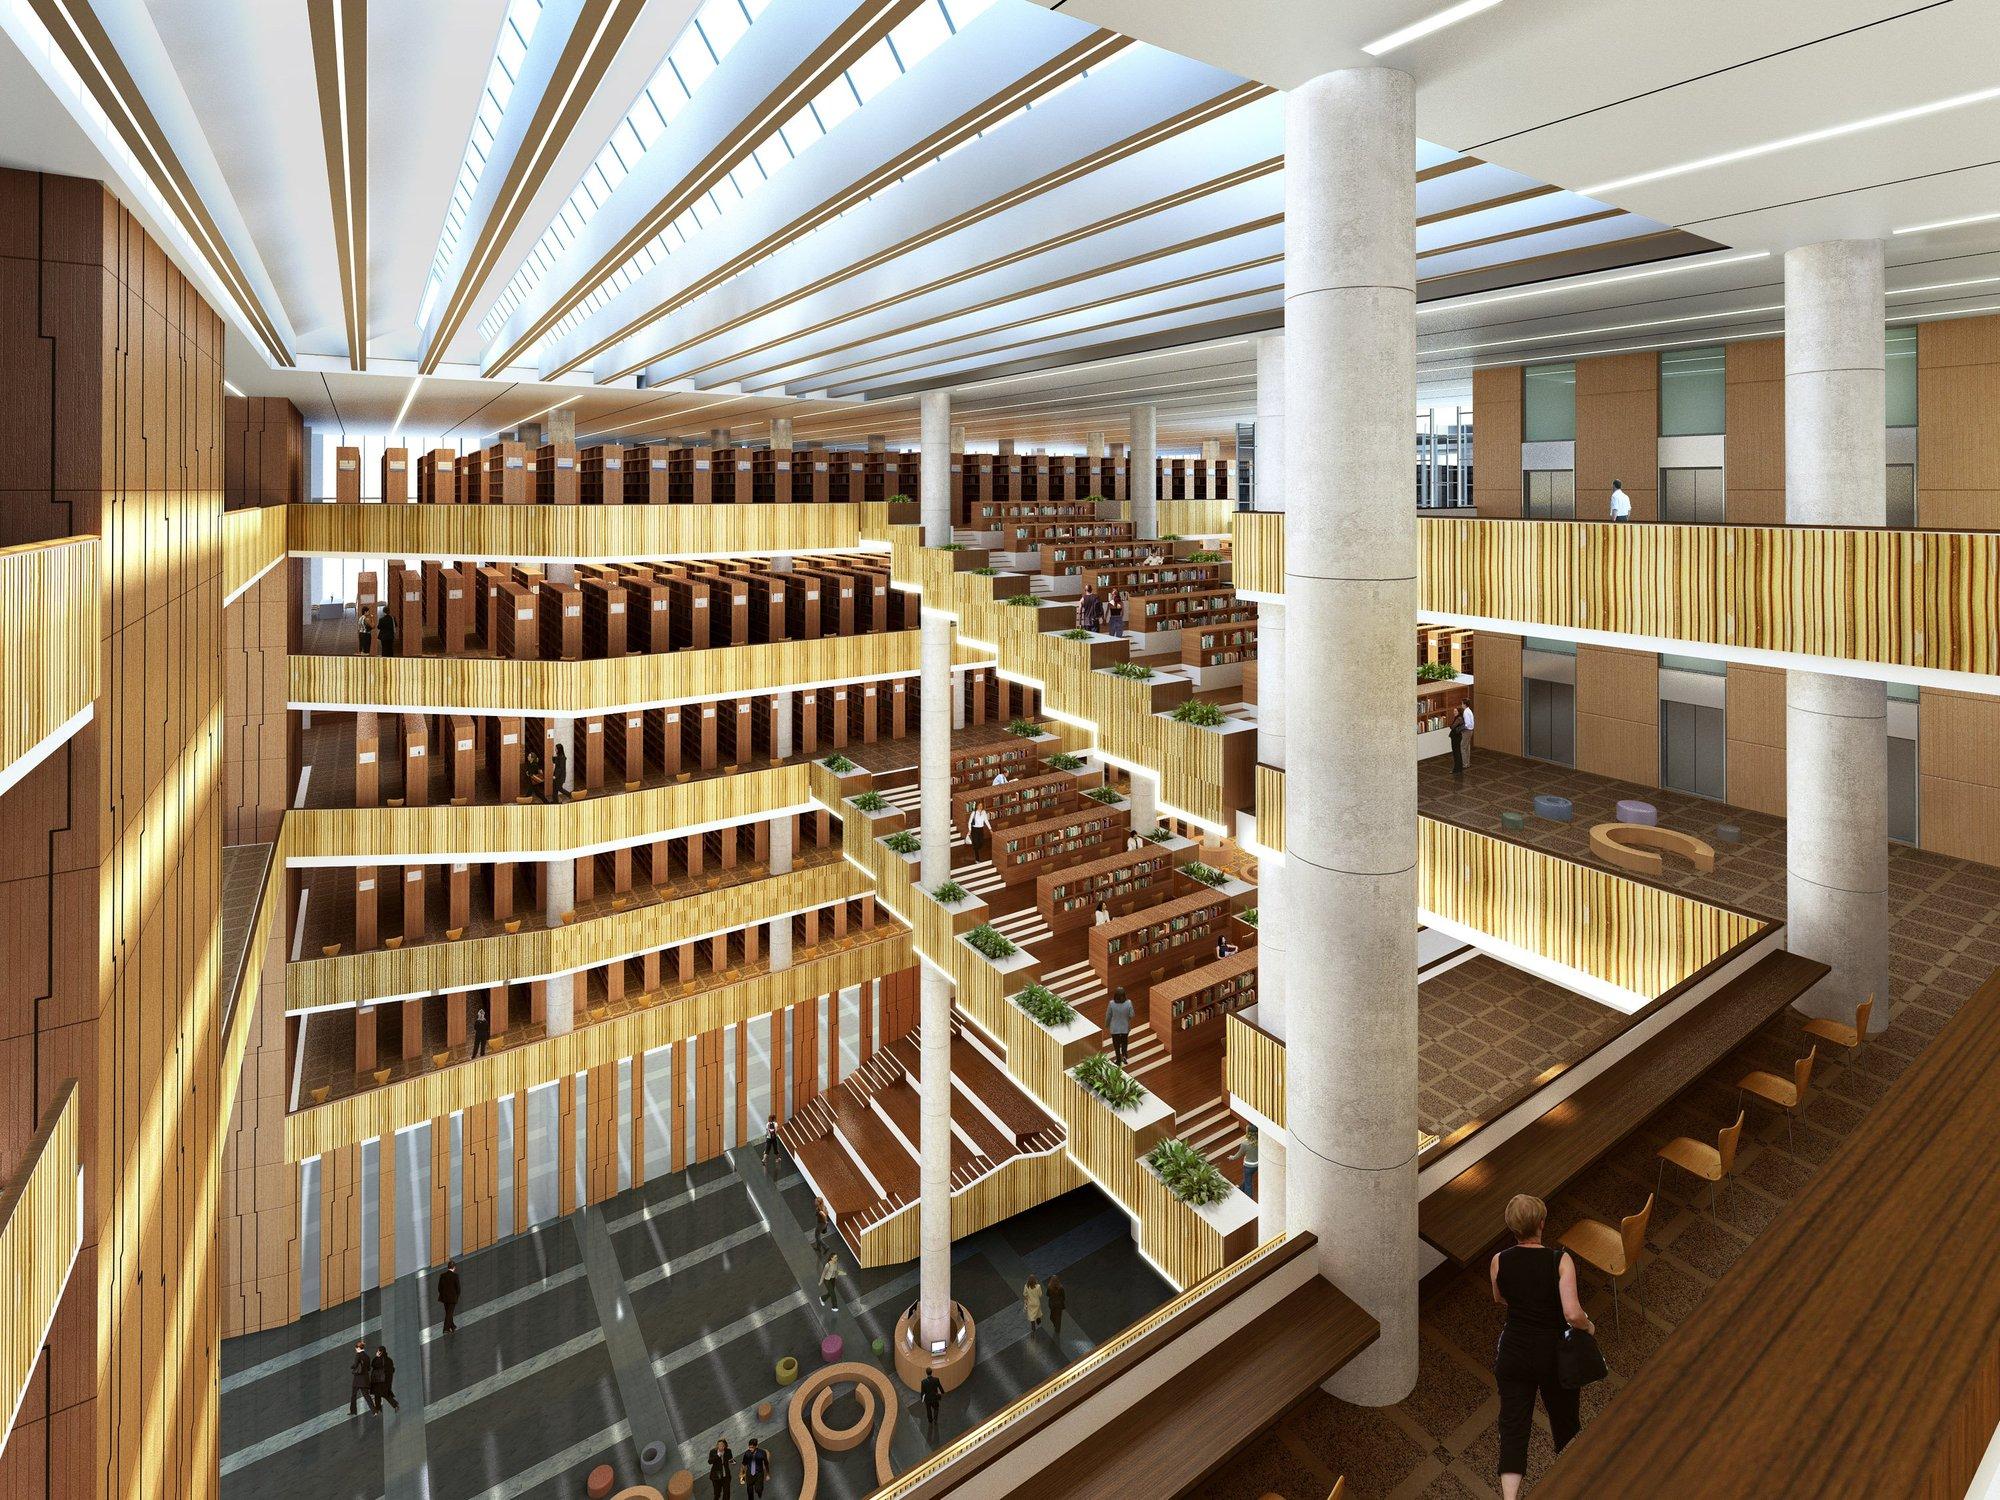 University Library Design